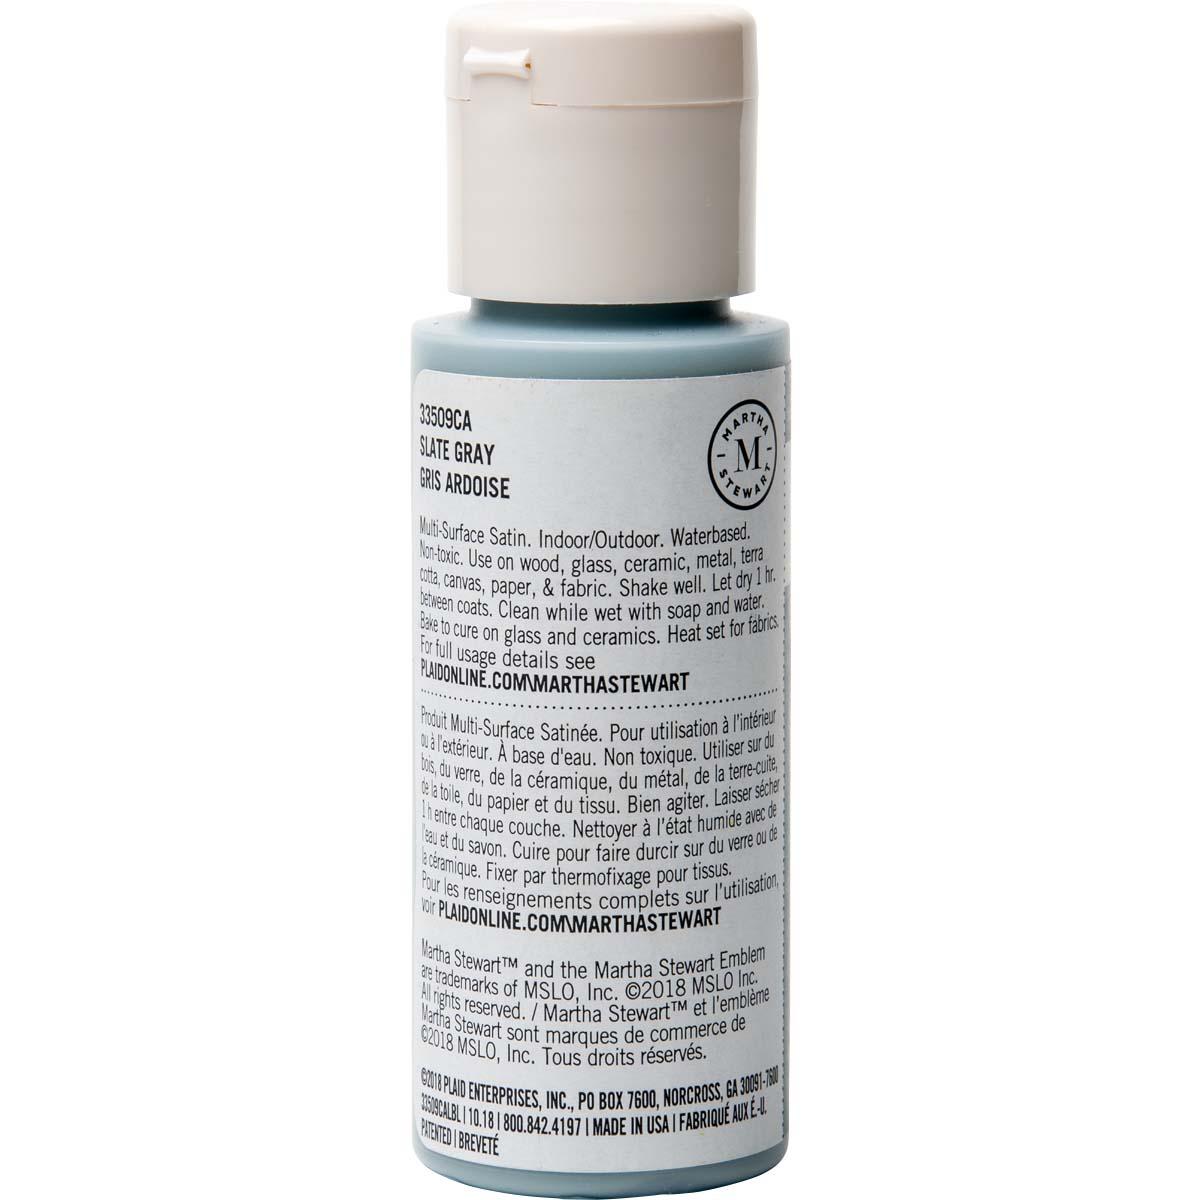 Martha Stewart® 2oz Multi-Surface Satin Acrylic Craft Paint - Slate Gray